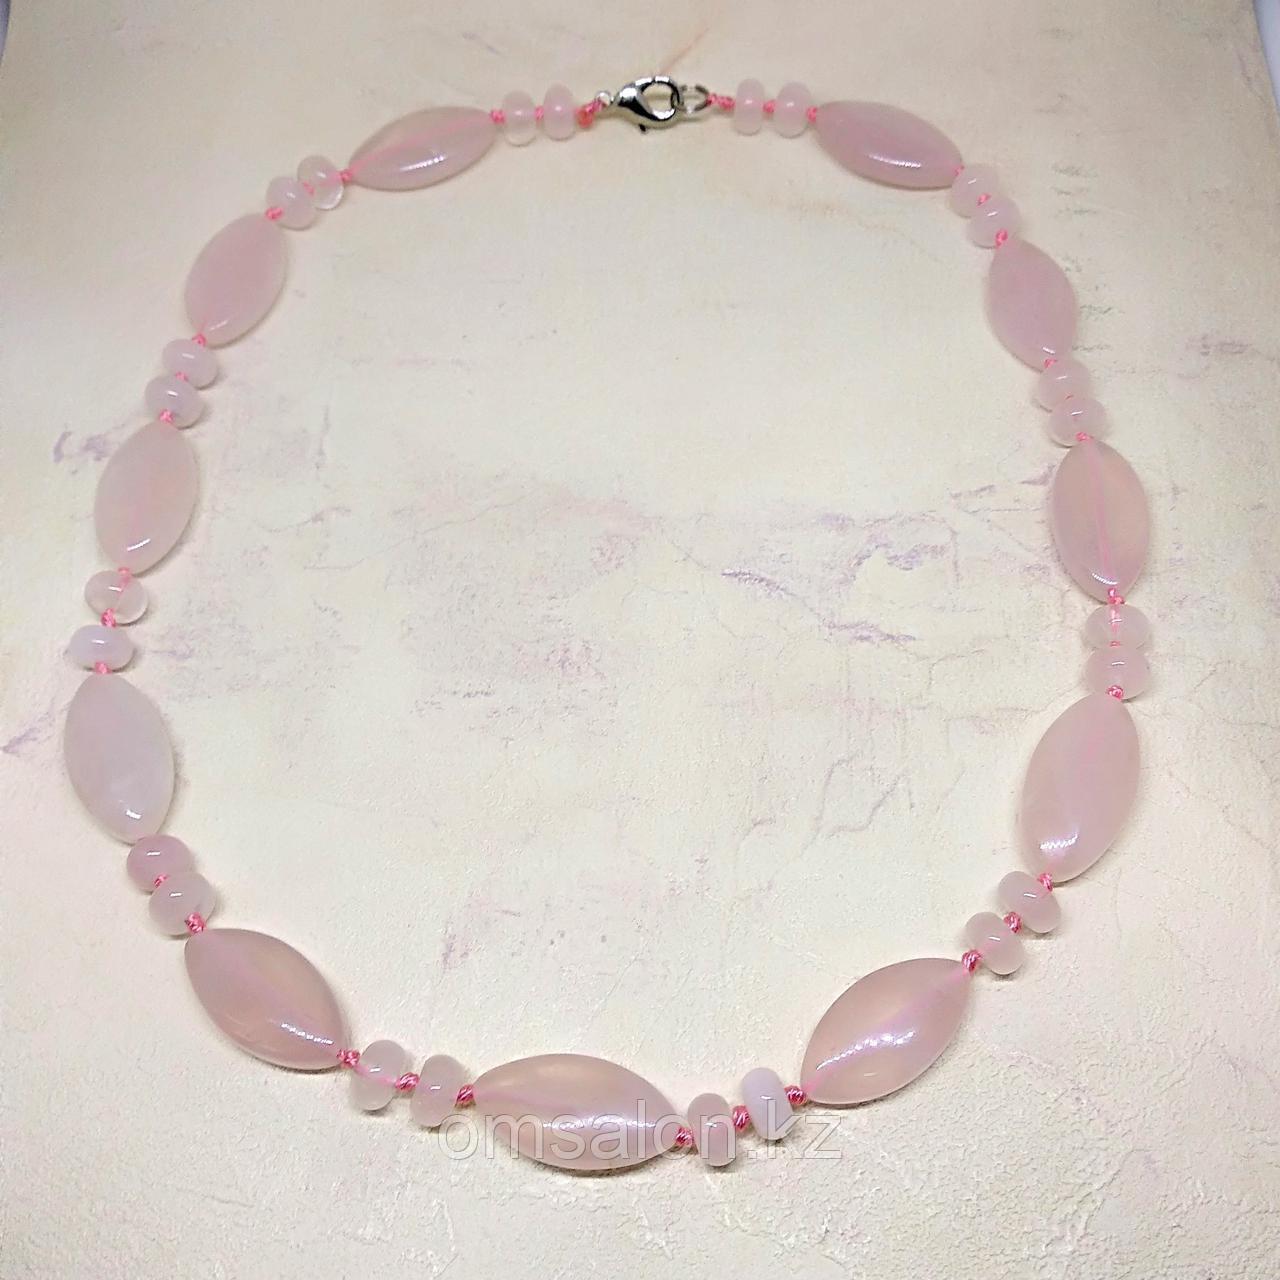 Бусы из натурального розового кварца